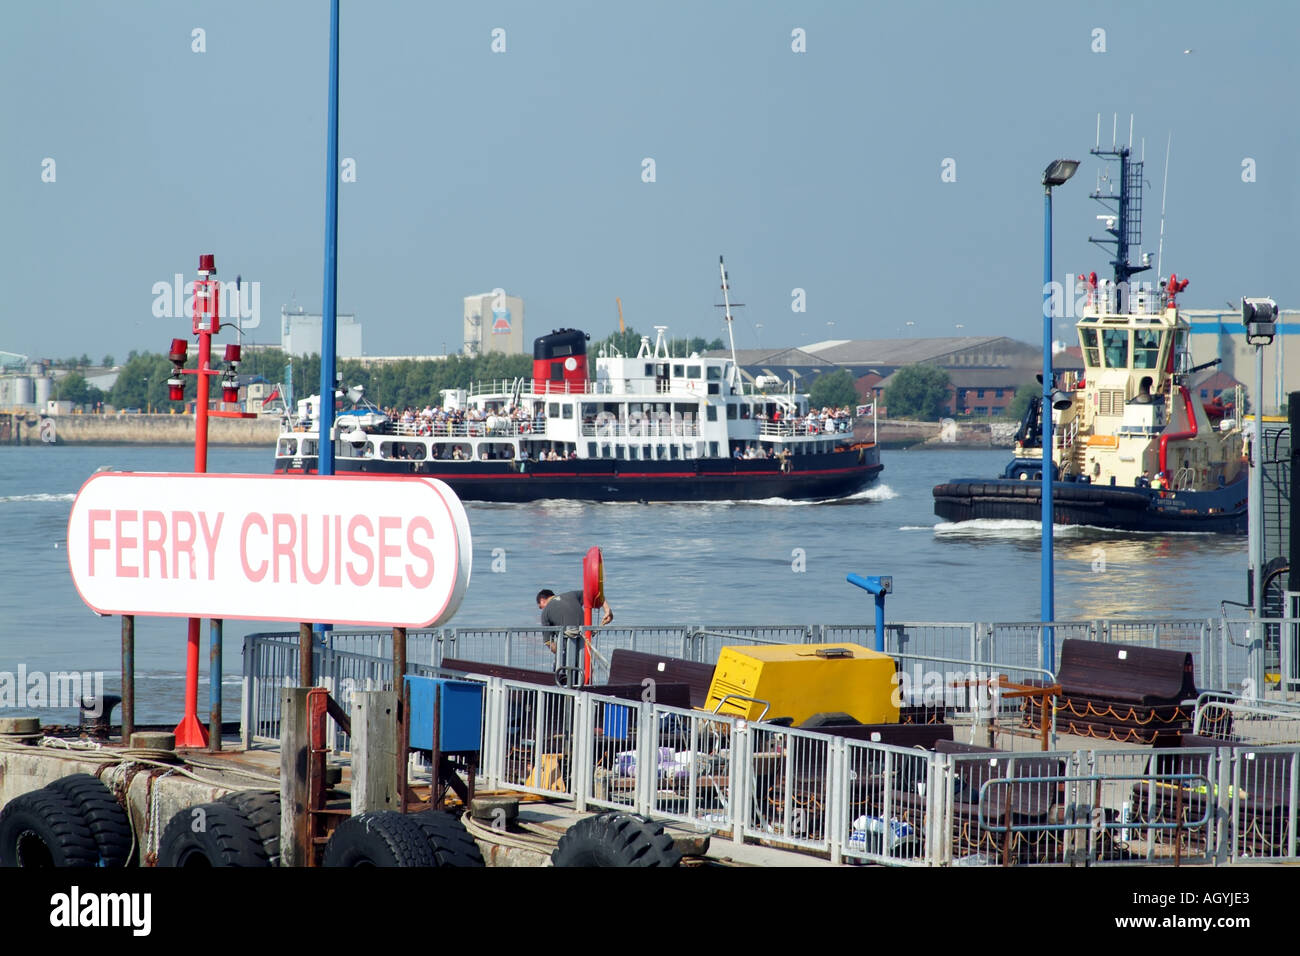 Mersey Ferry Royal Iris departs Pier Head Liverpool England UK - Stock Image